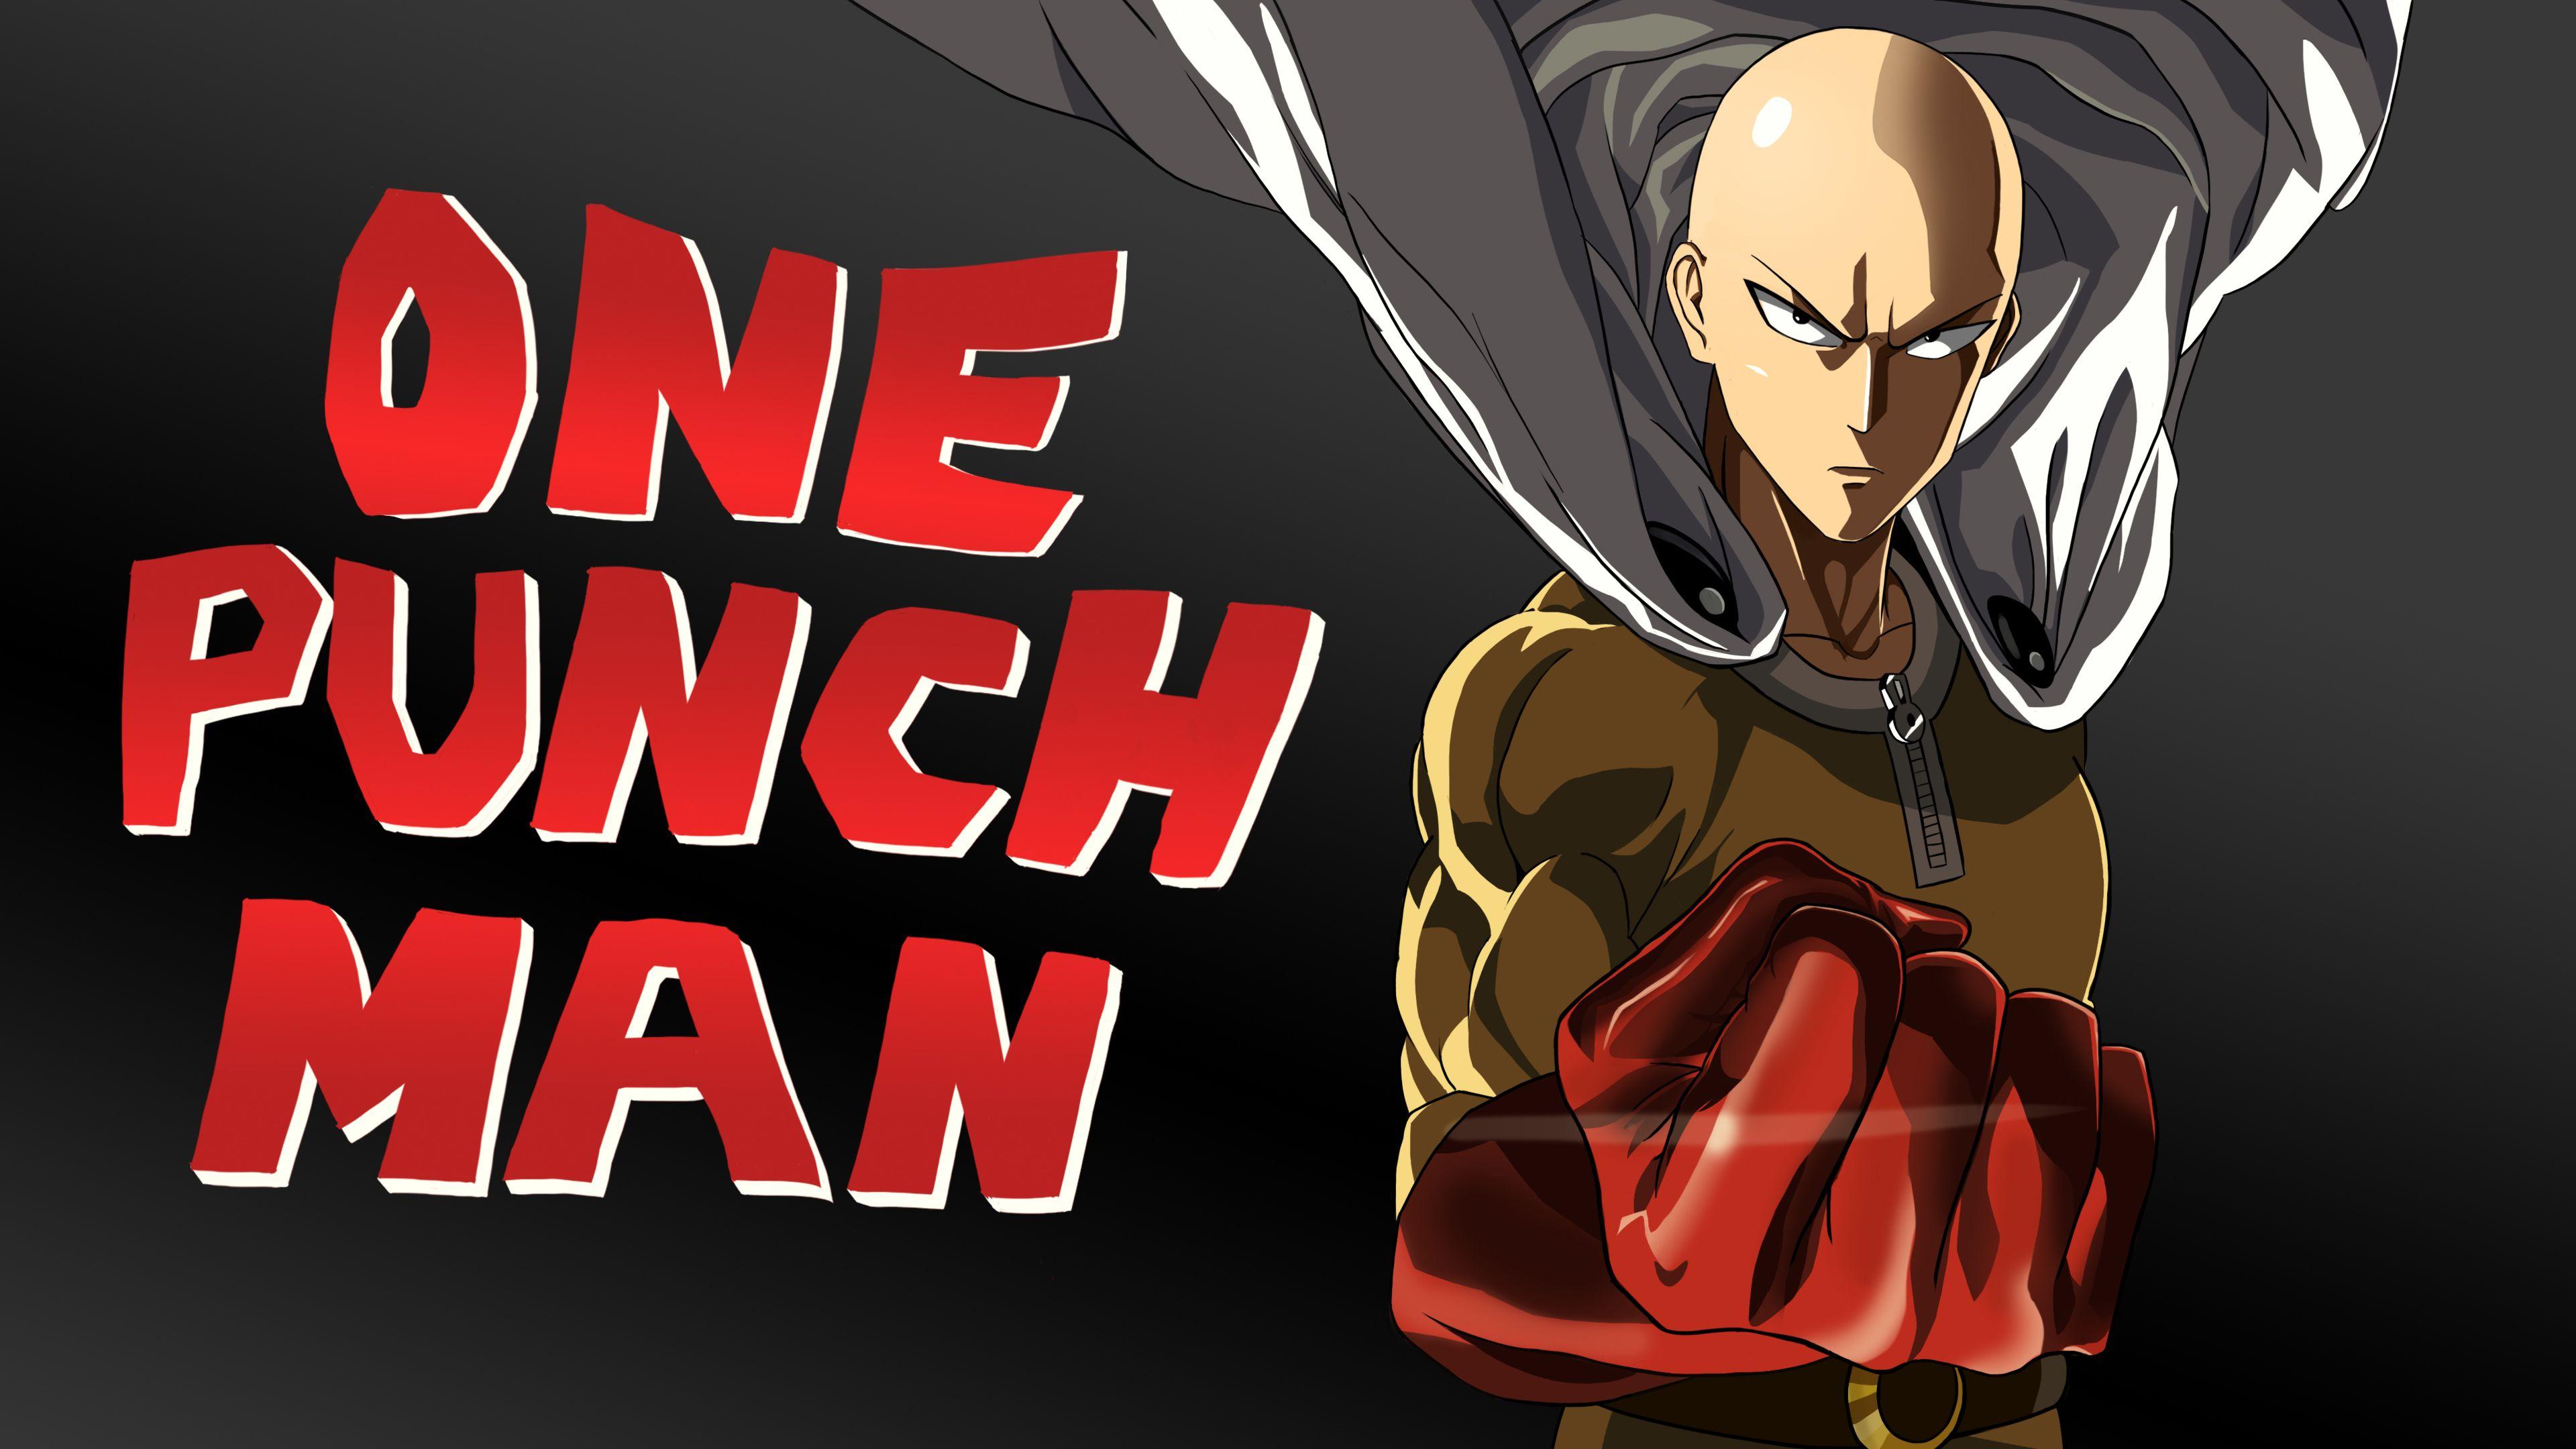 One Punch Man Saitama Art One Punch Man Anime One Punch Man